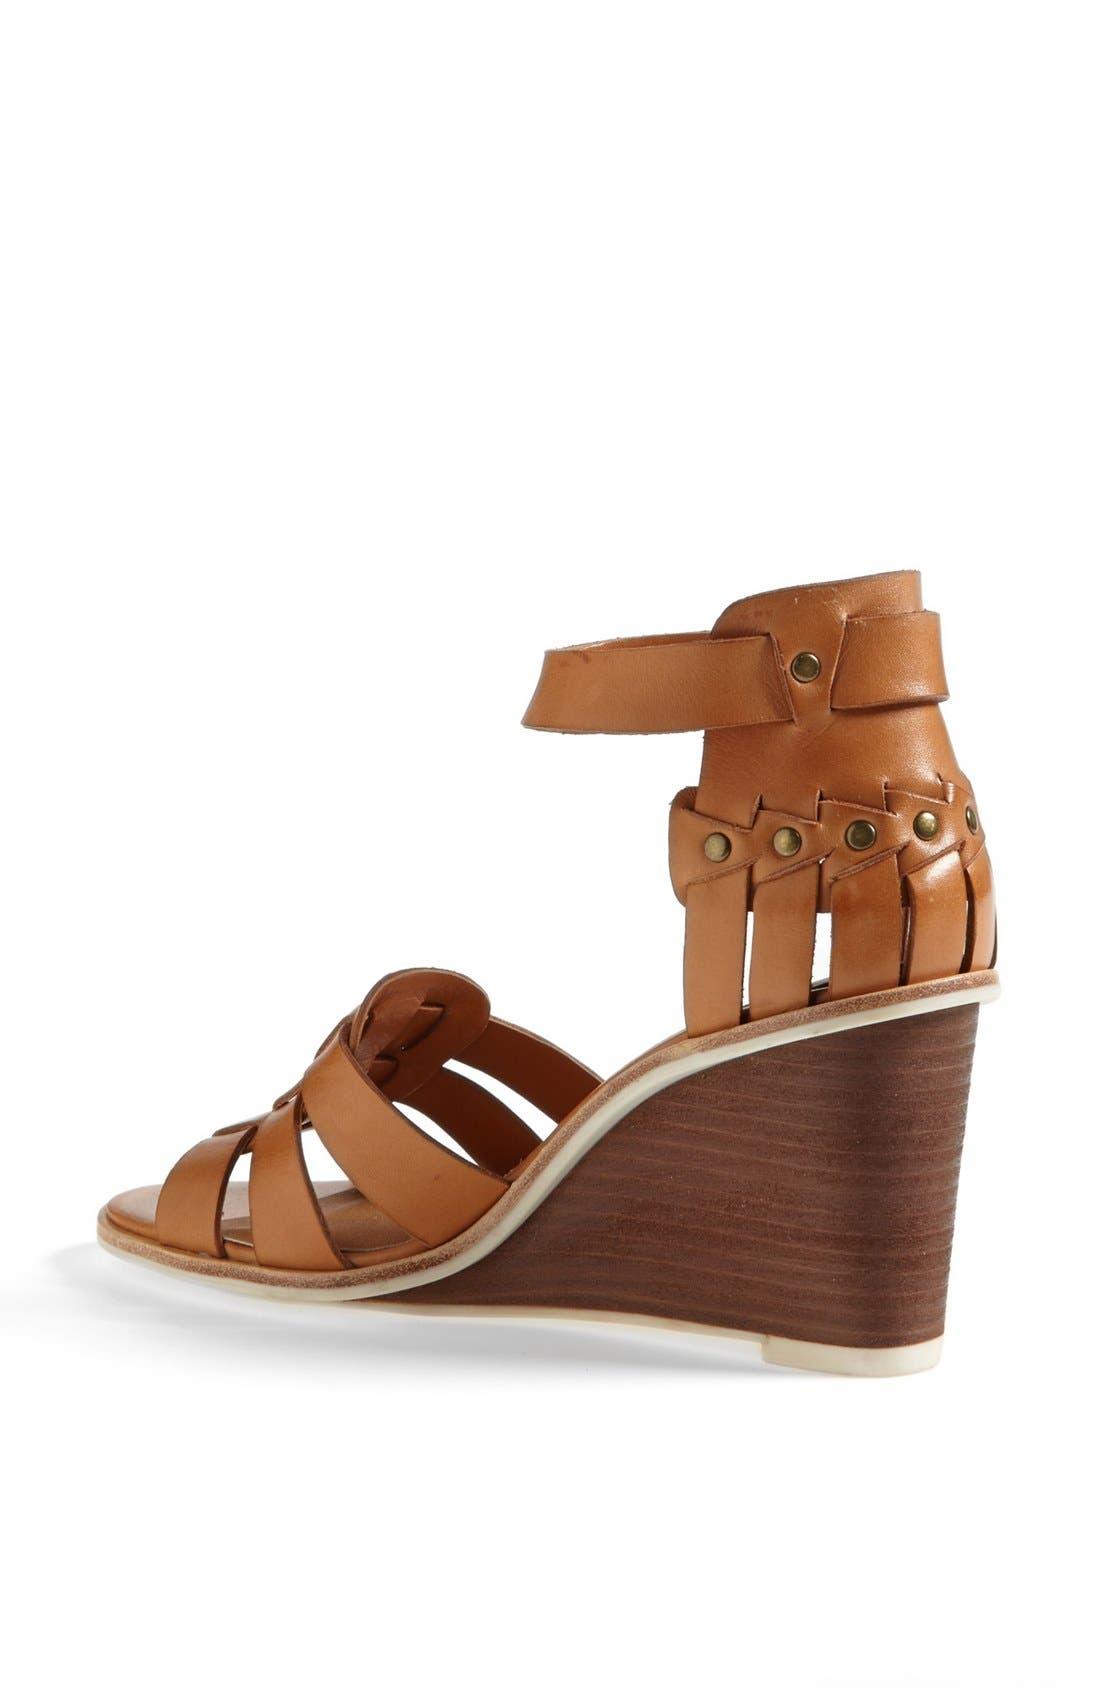 DV by Dolce Vita 'Cho' Wedge Sandal,                             Alternate thumbnail 2, color,                             Honey Leather